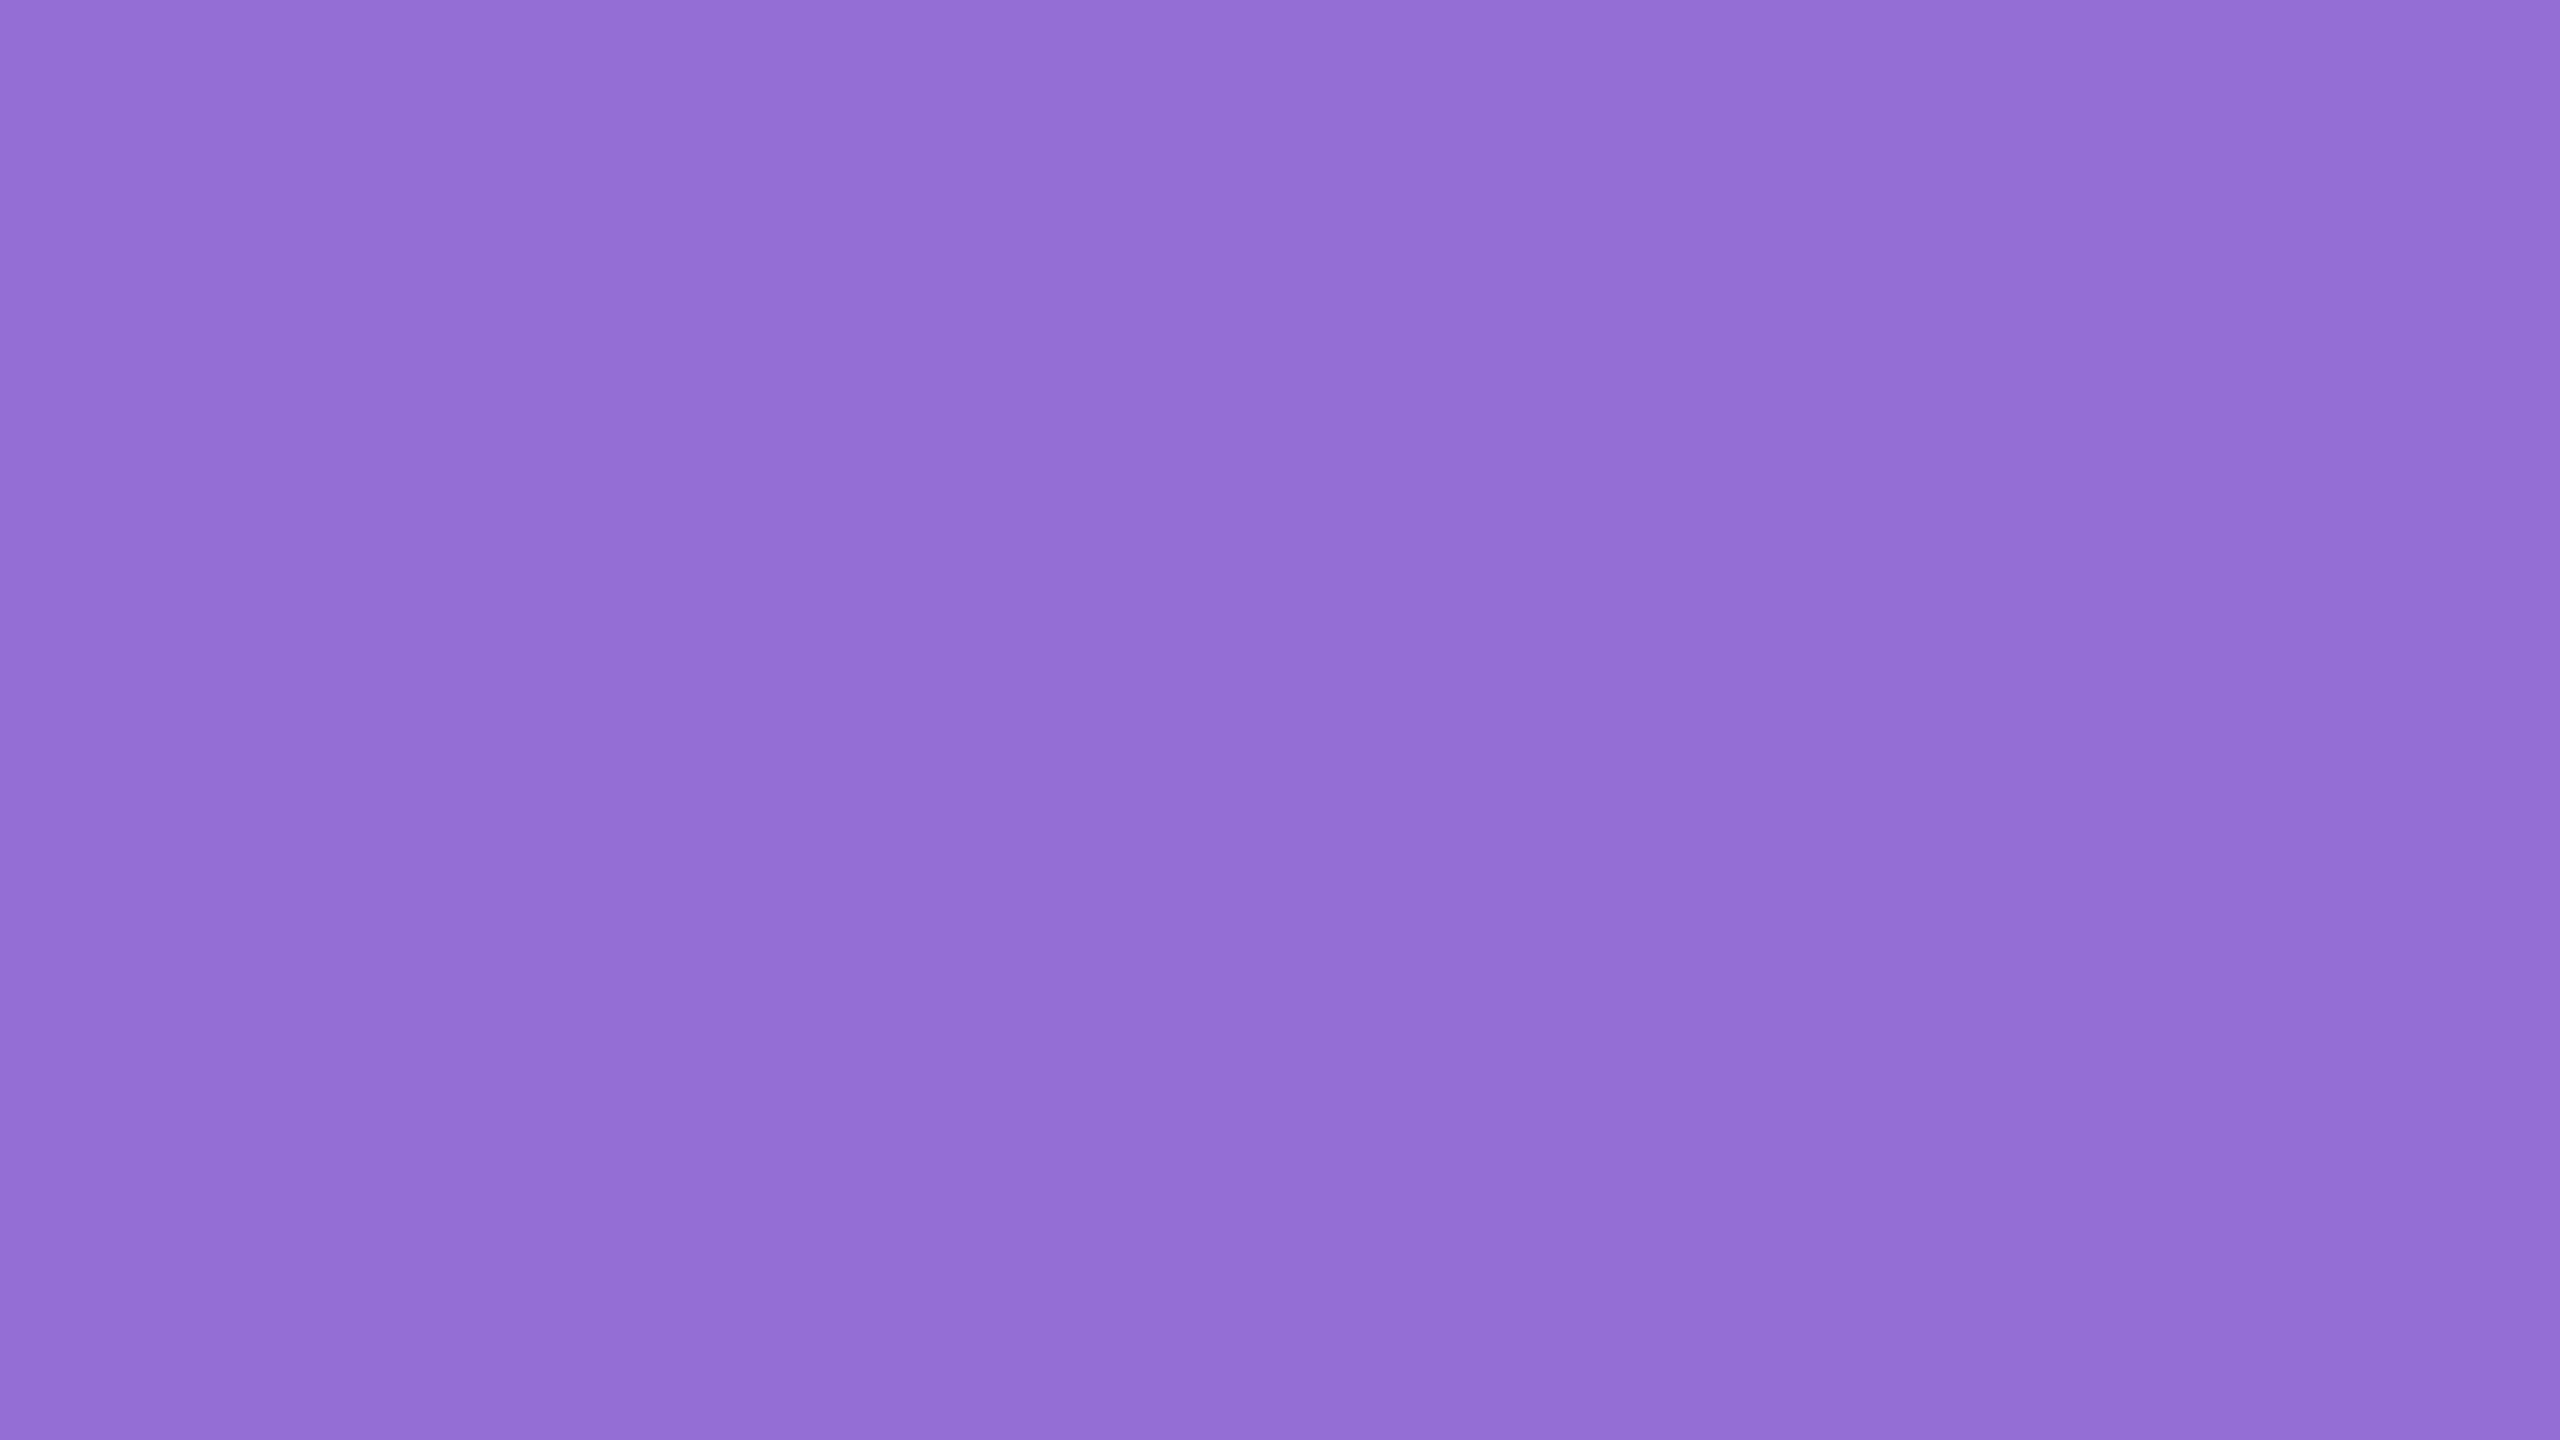 2560x1440 resolution Dark Pastel Purple solid color background 2560x1440